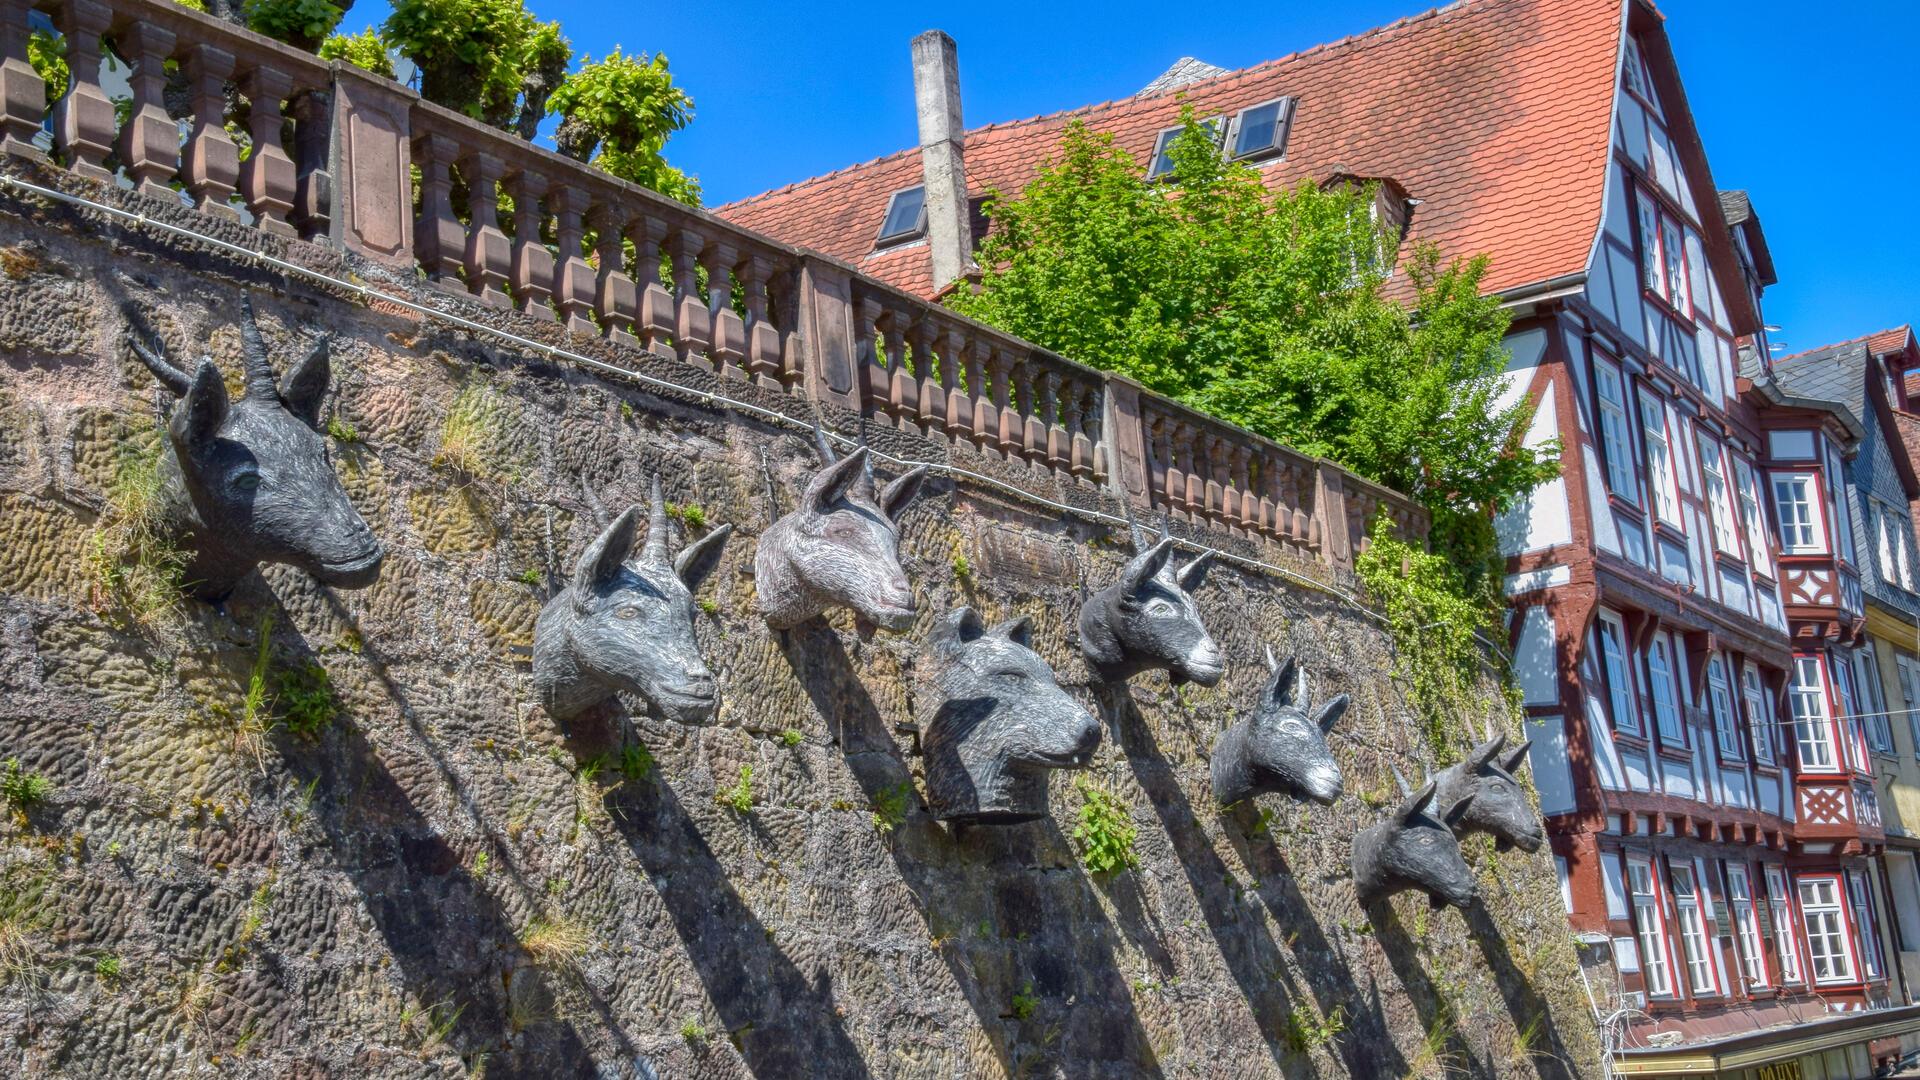 Der Grimm-Dich-Pfad in Marburg